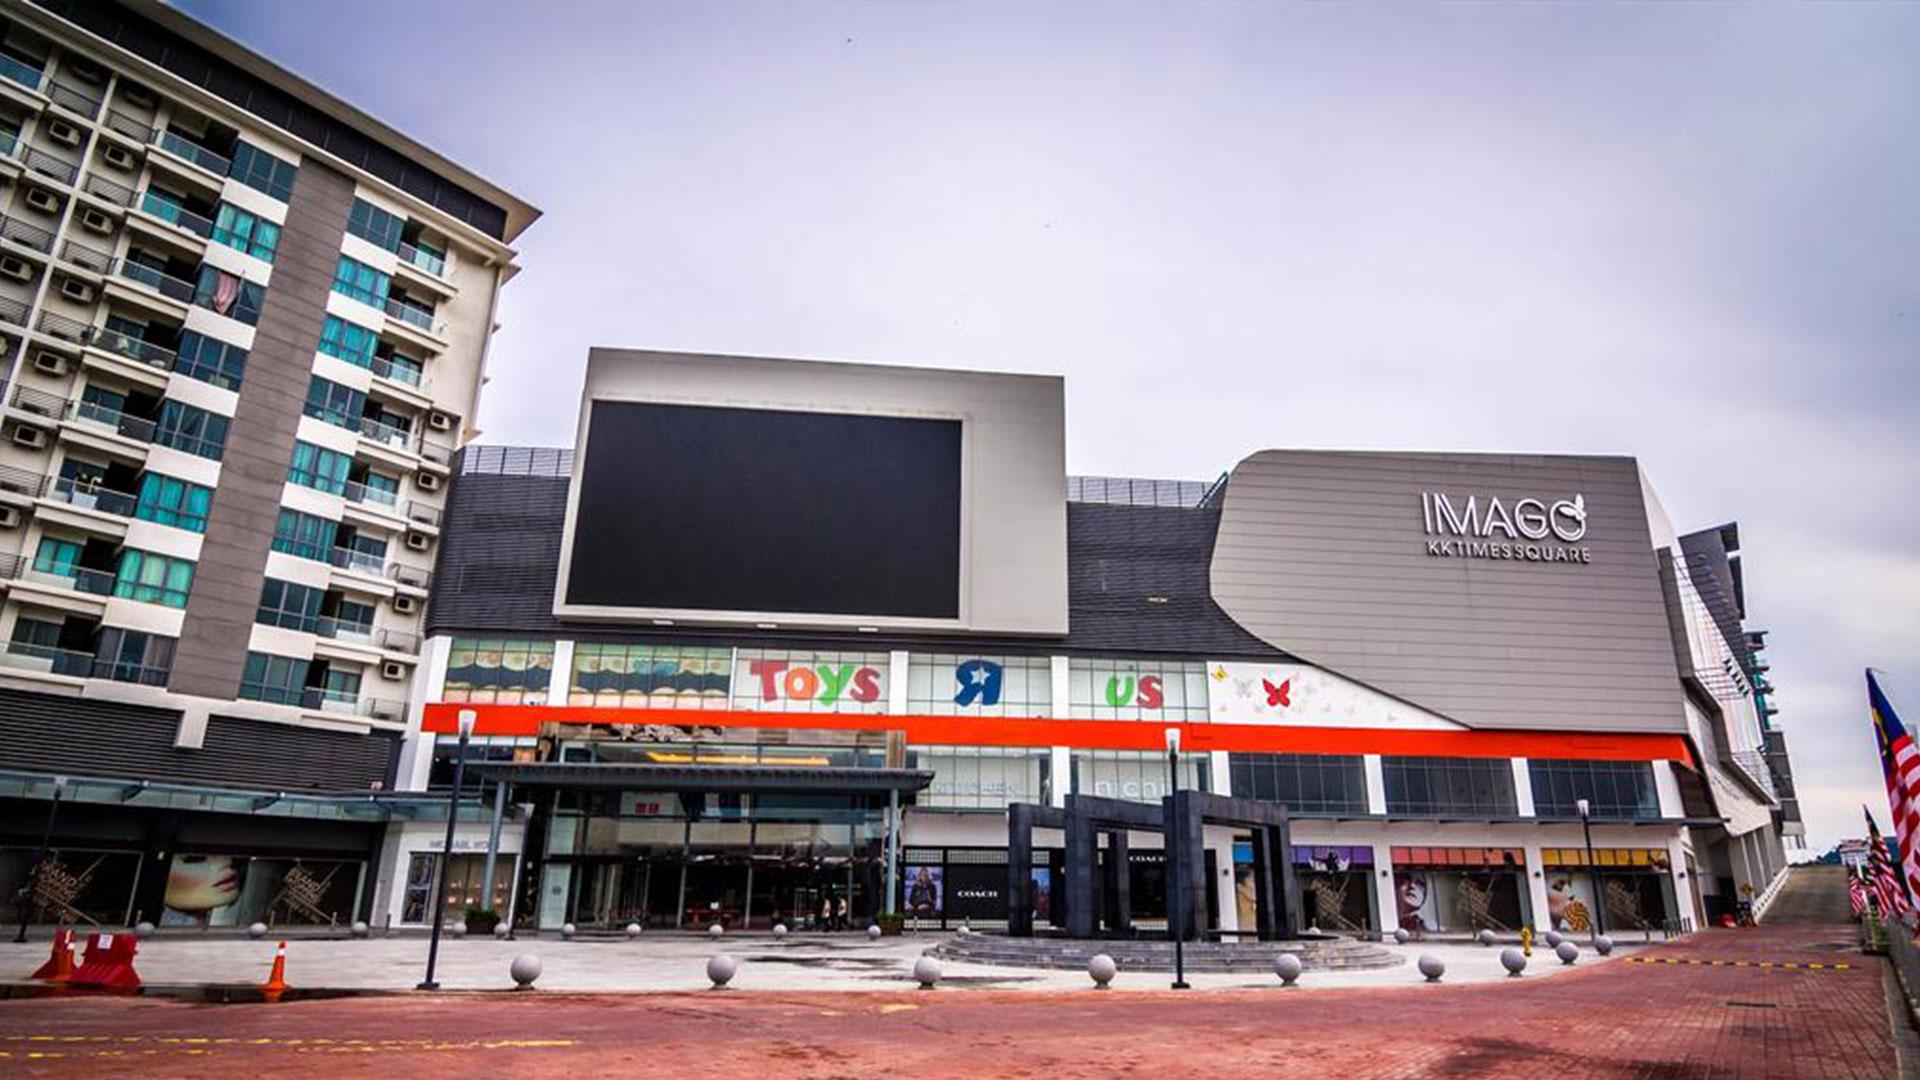 Kota-Kinabalu-Times-Square-banner